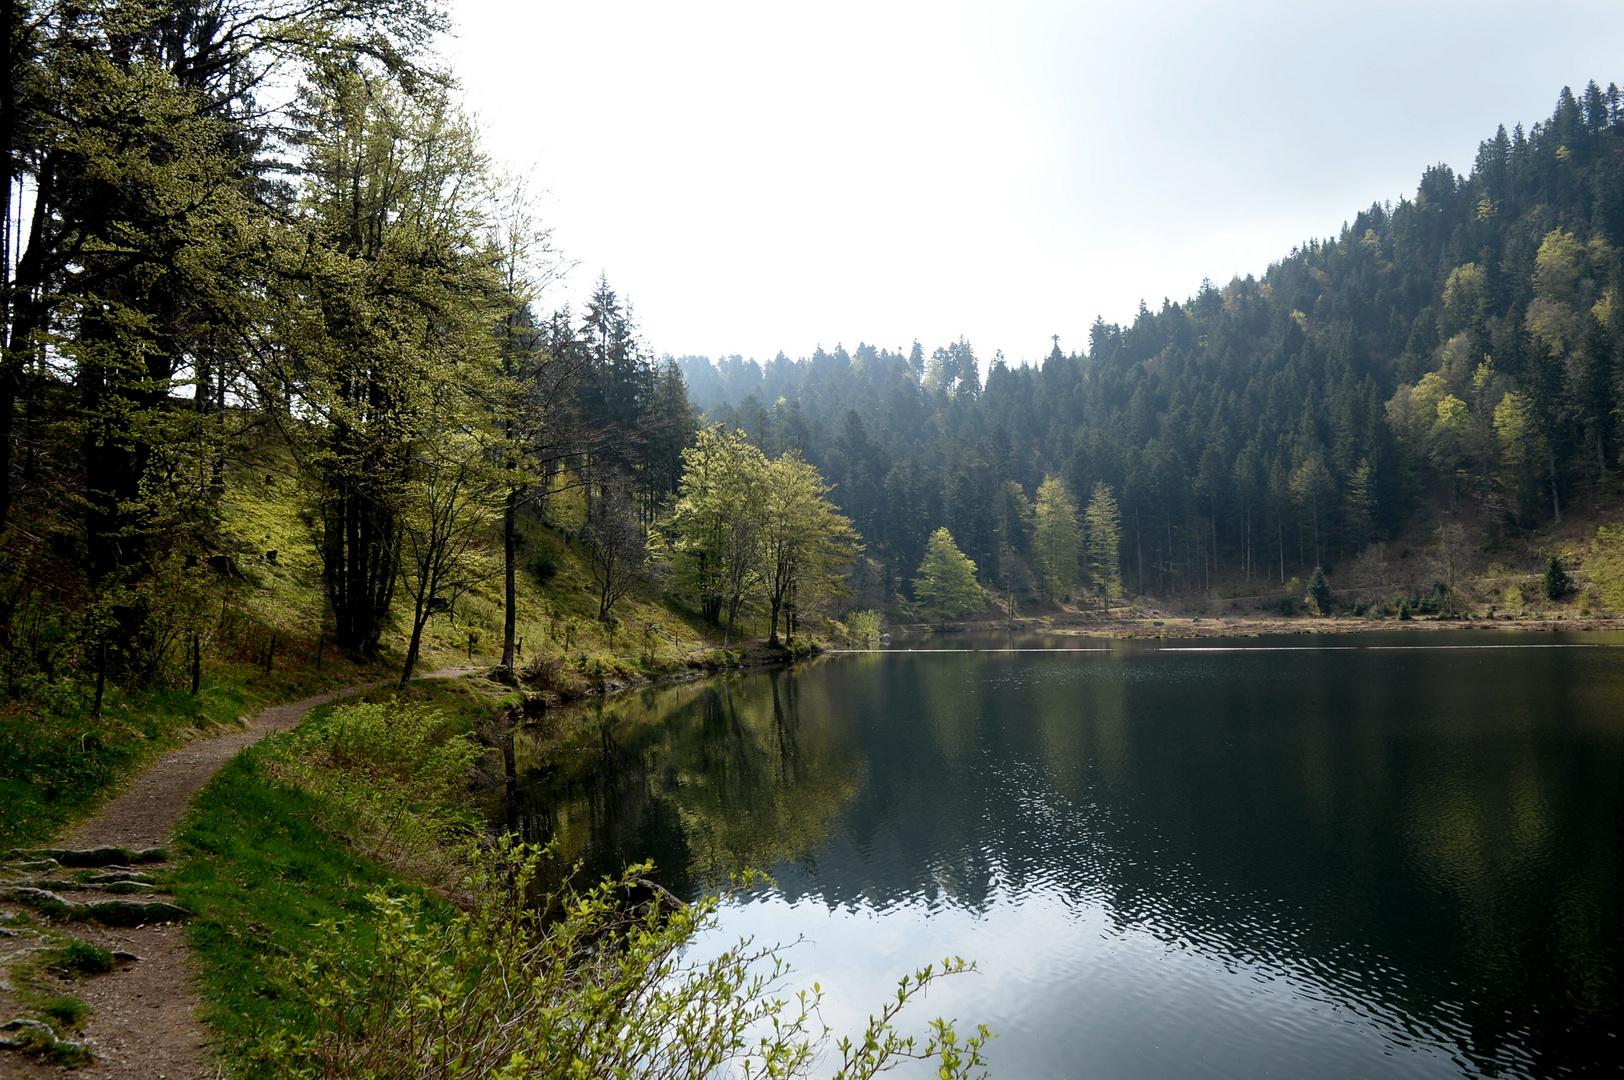 Nonnenmattweiher Südschwarzwald I